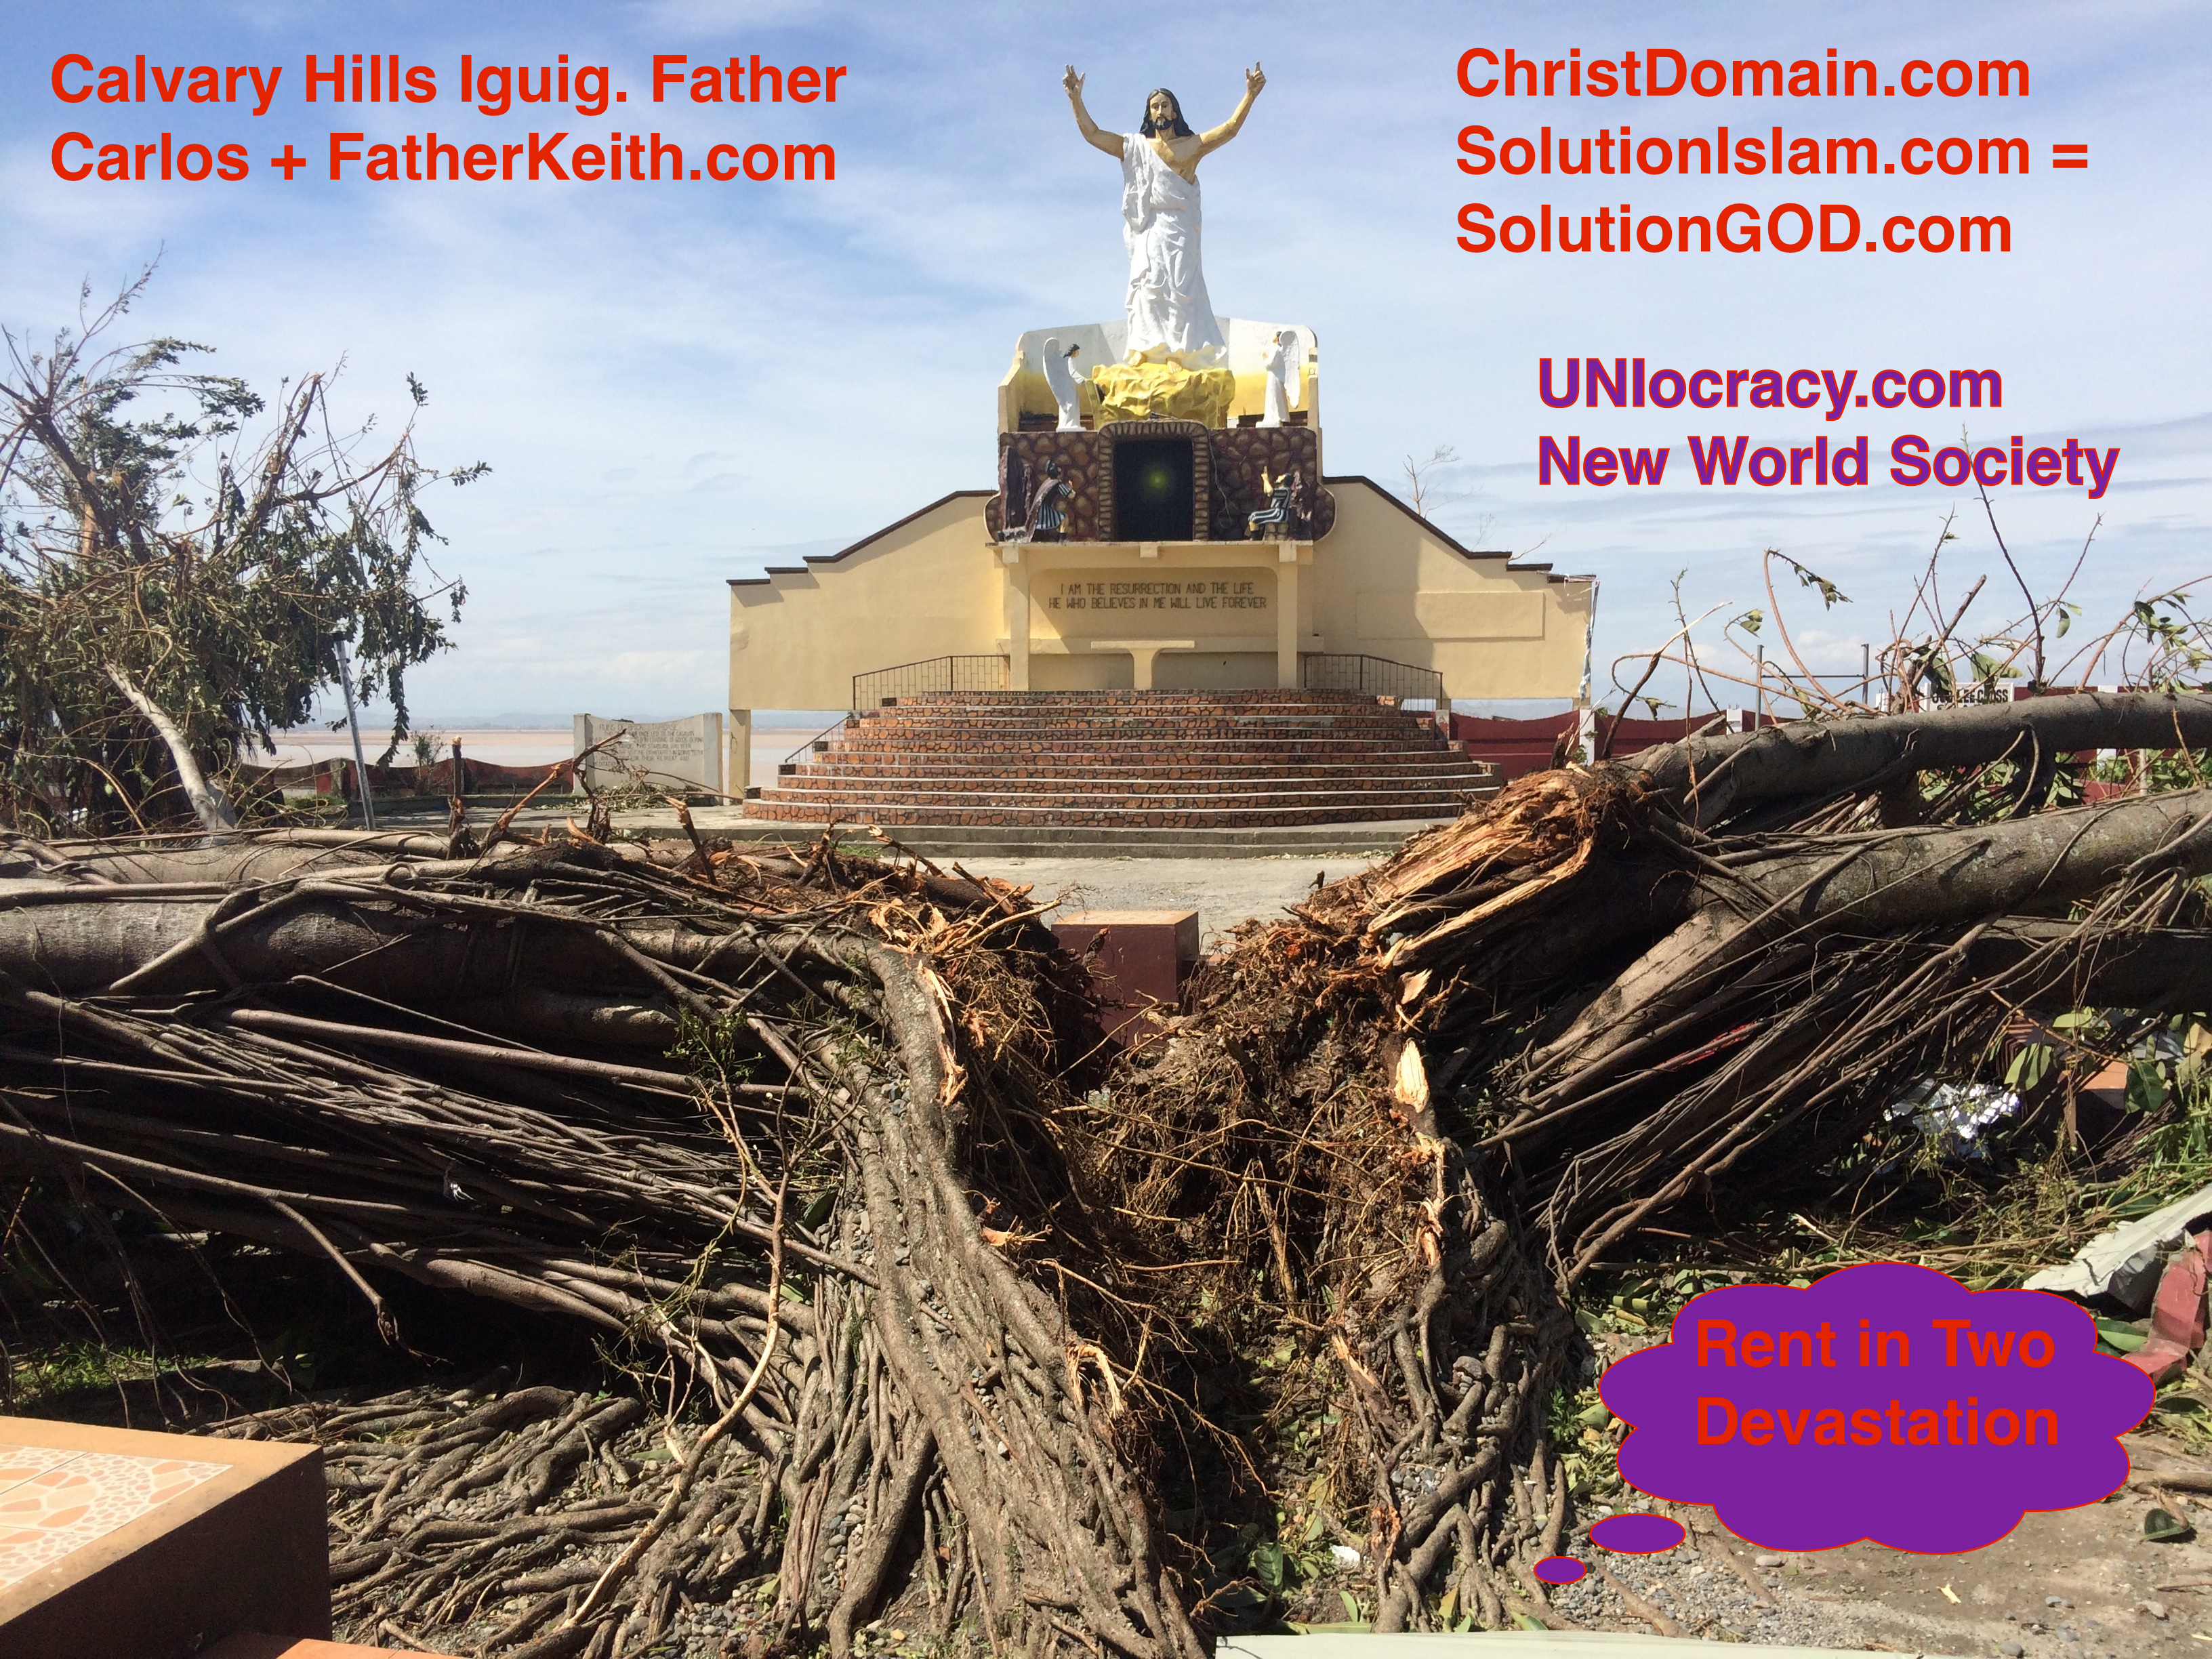 BBK20161021-CalvaryHills-Iguig-ChurchLawin-SplitTree-RentAssunder2